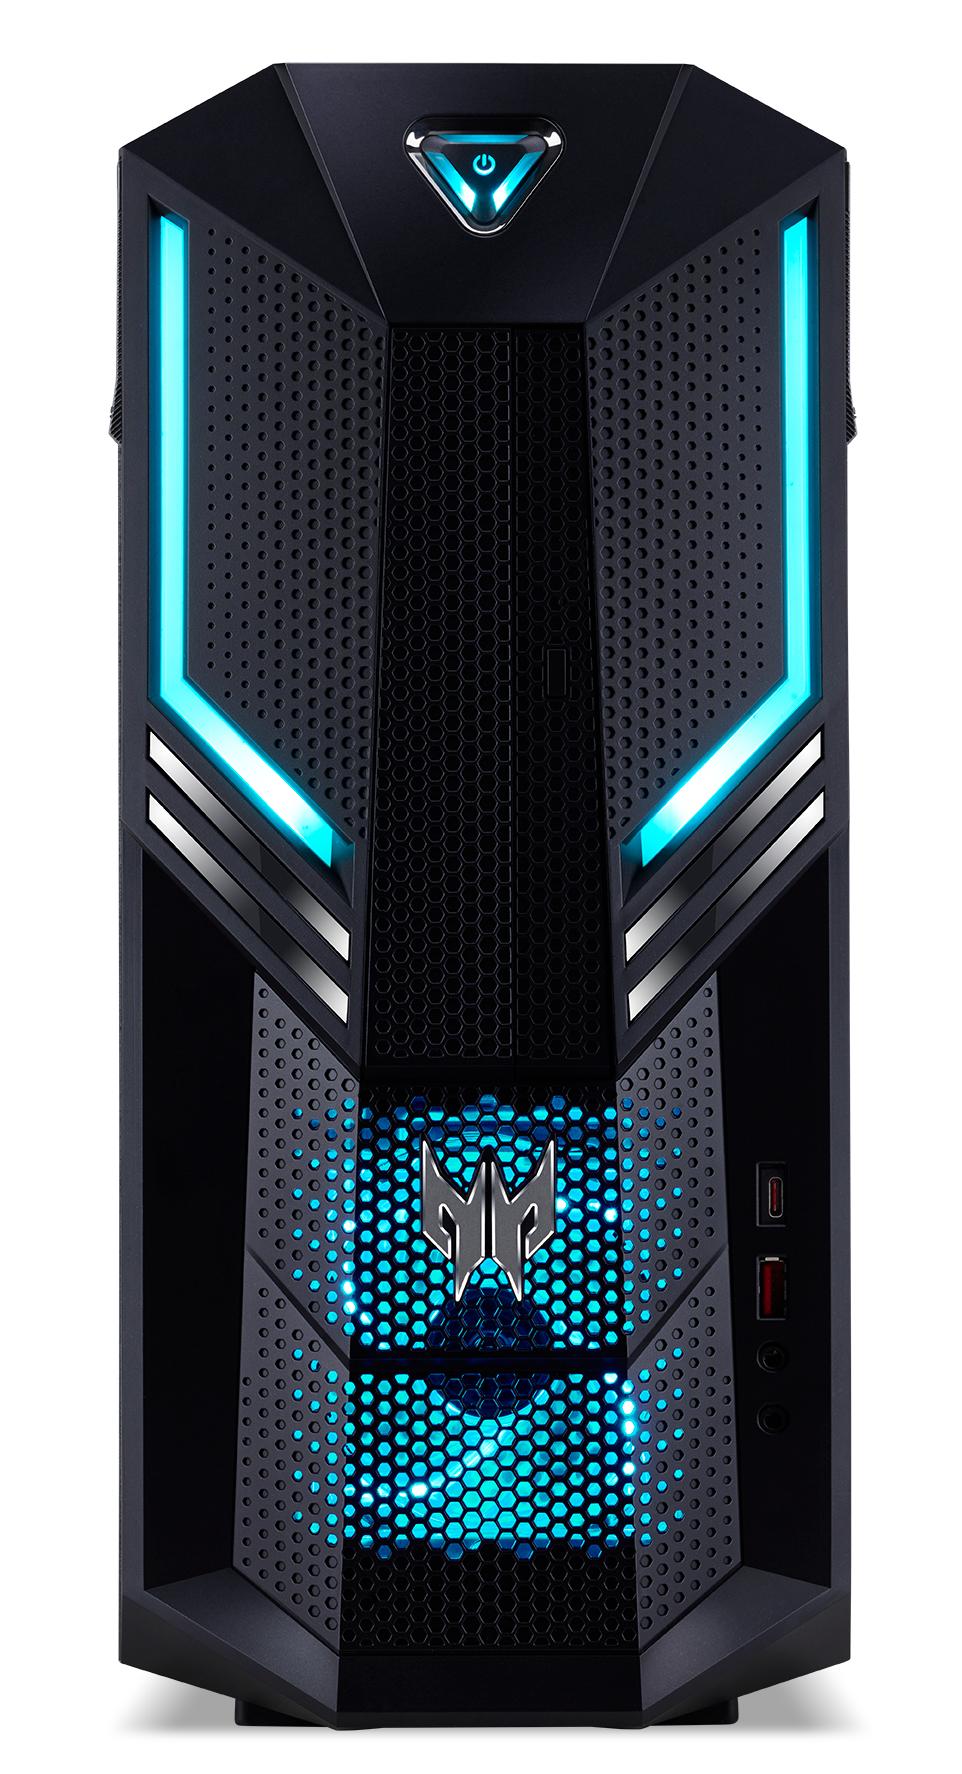 Acer Predator Orion 3000 600 I72070-01 Intel® 8ste generatie Core™ i7 i7-8700 16 GB DDR4-SDRAM 1256 GB HDD+SSD Zwart Toren PC